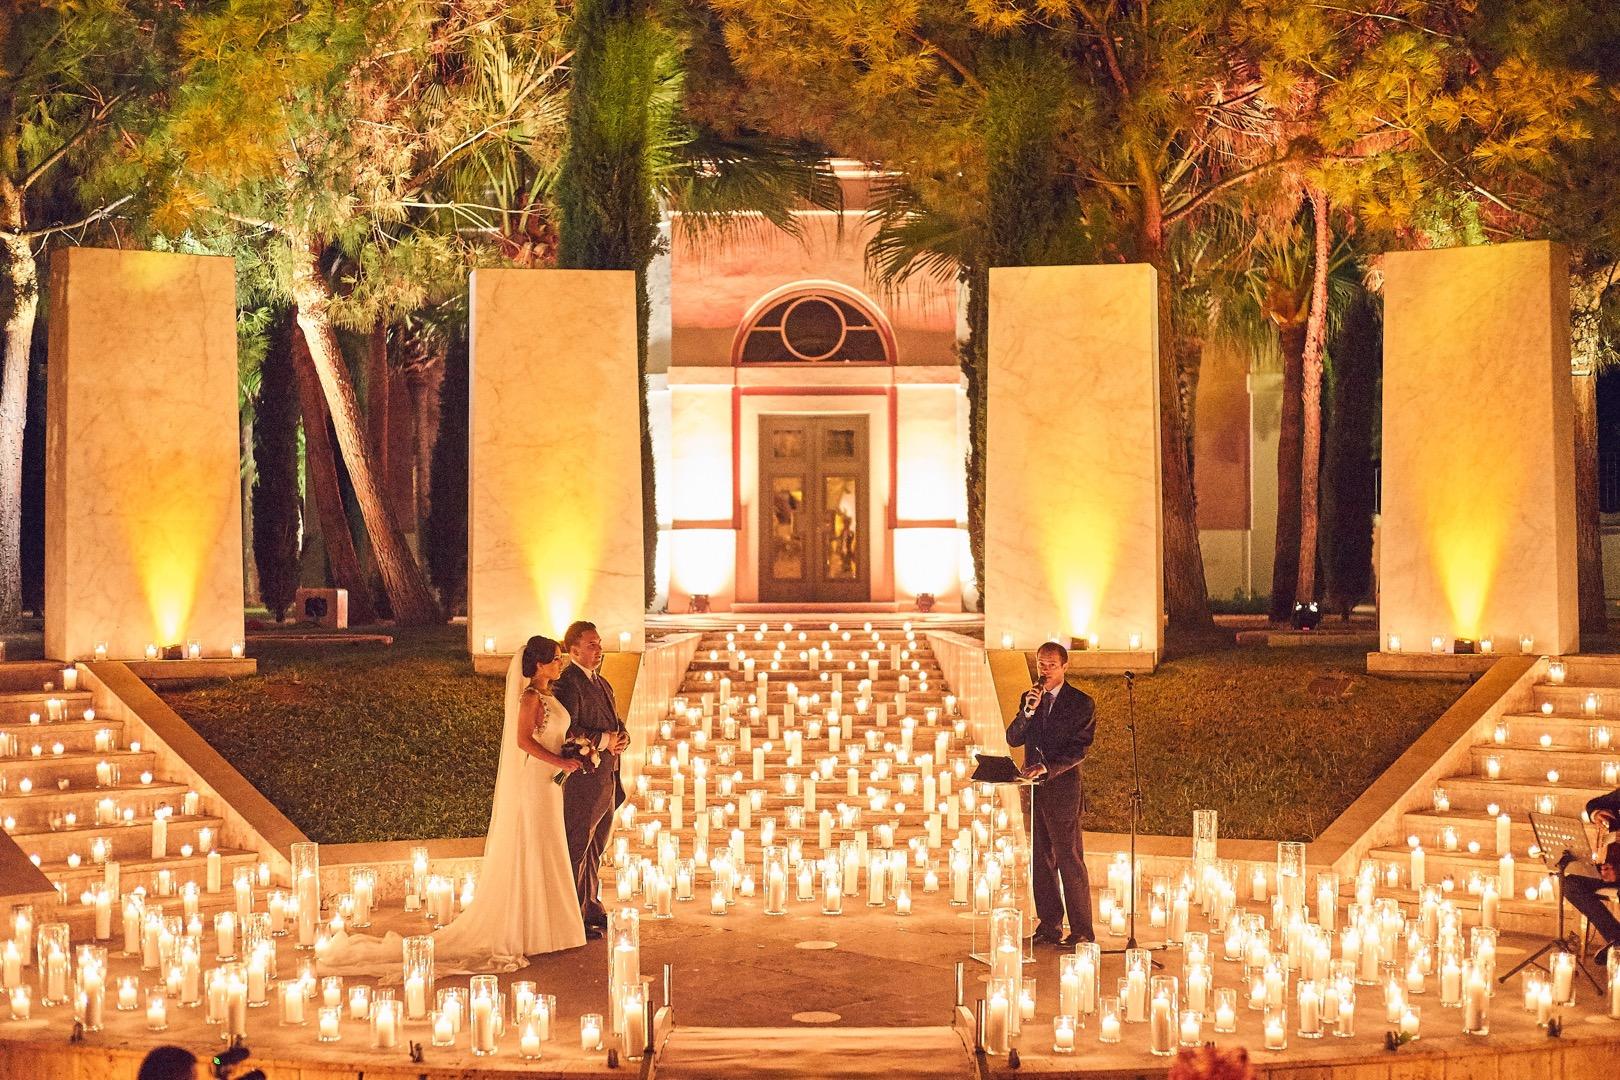 Si-Quiero-Wedding-Planner-By-Sira-Antequera-Bodas-Málaga-Marbella-Miami- Mariam-Guillermo-6